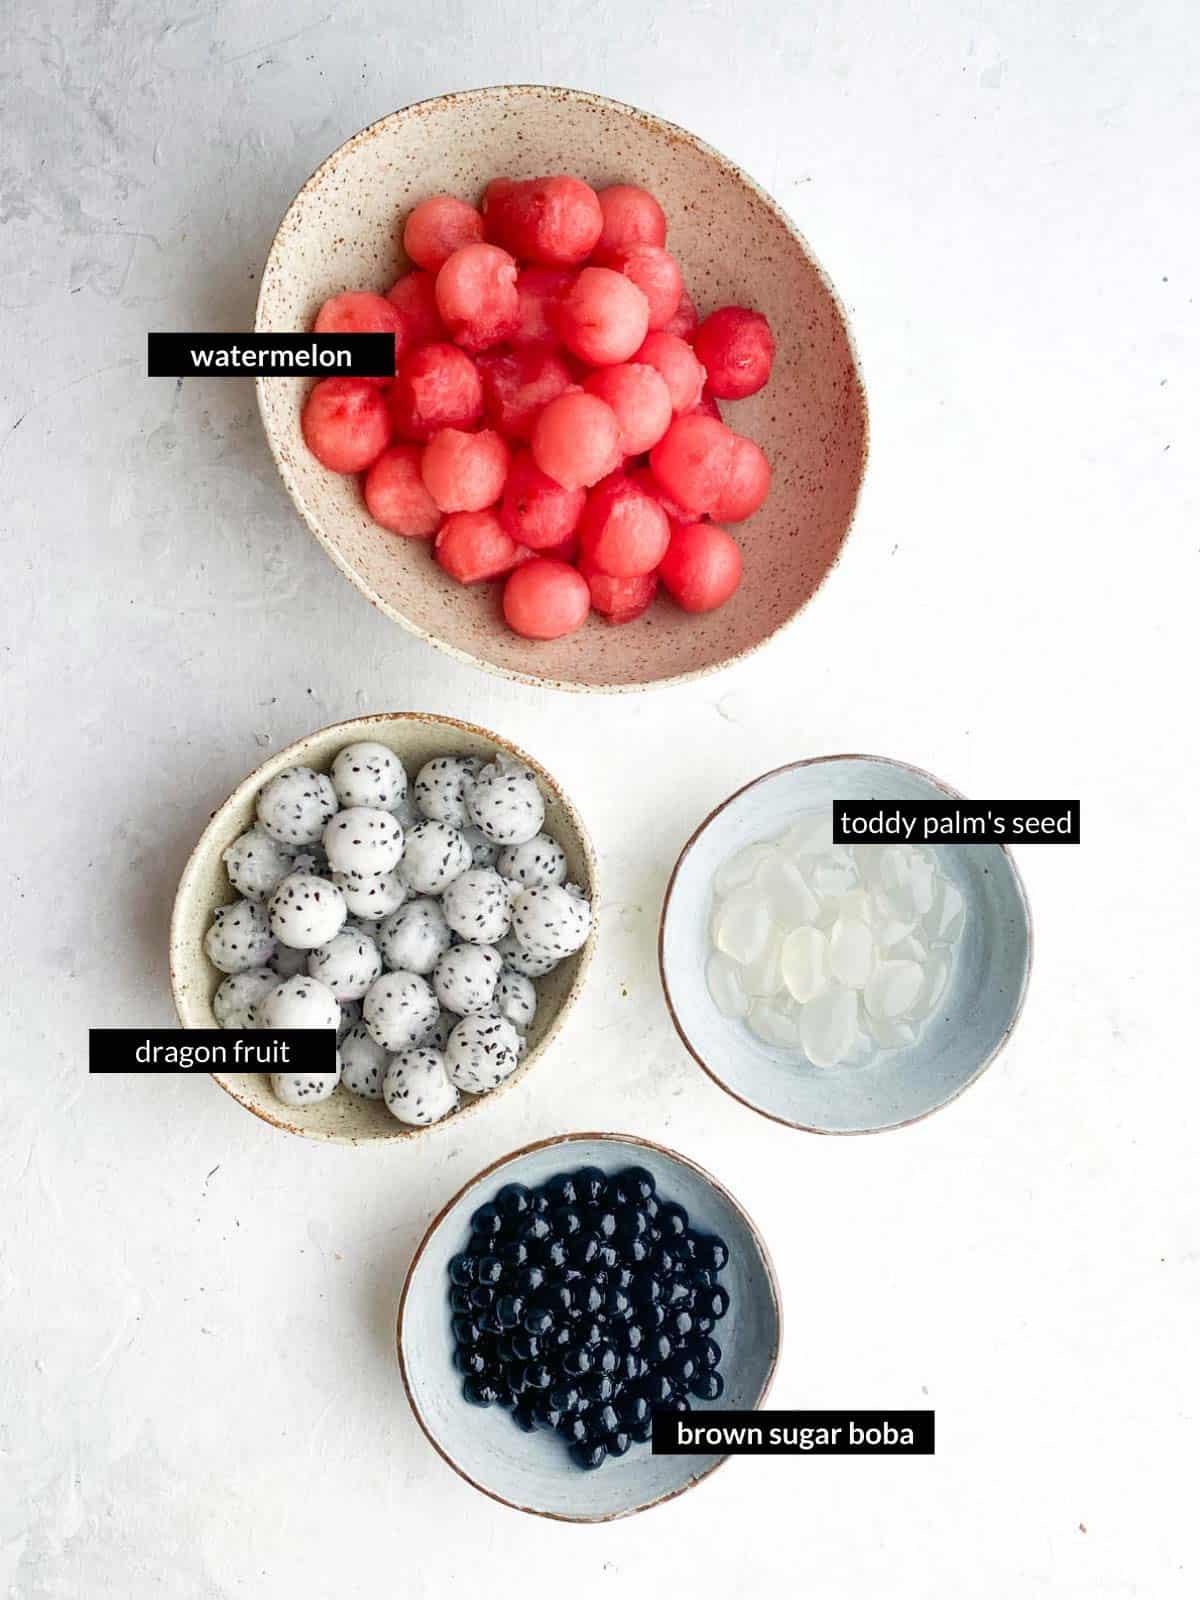 Watermelon Fruit Salad with Brown Sugar Boba Ingredients